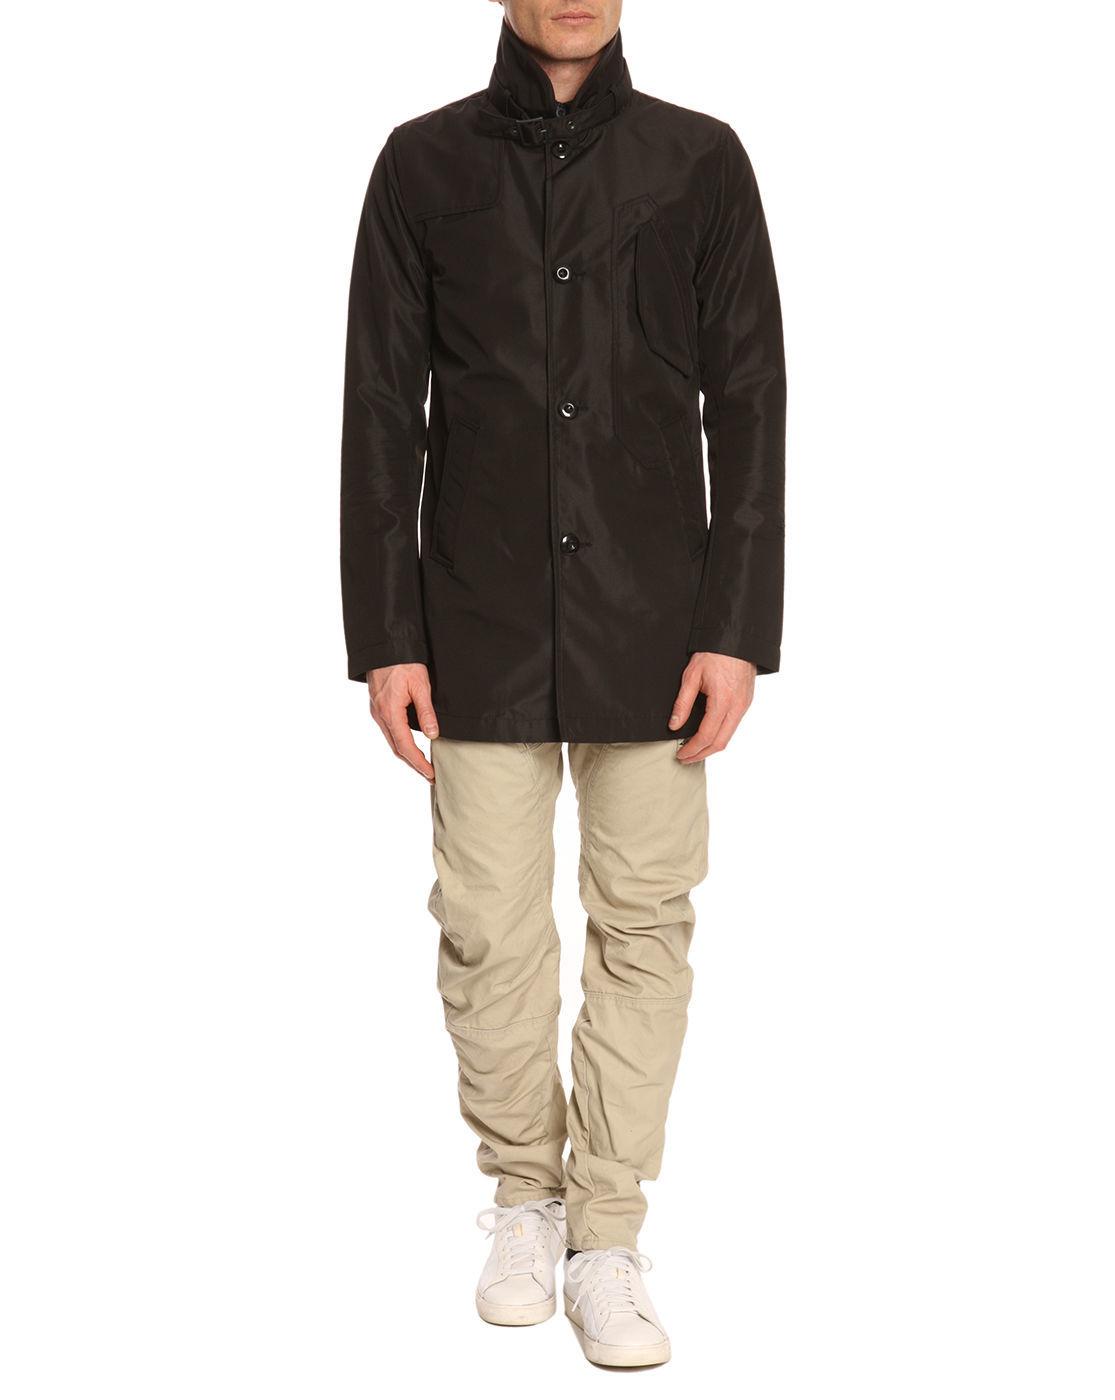 g star raw mas garber black trench coat in black for men lyst. Black Bedroom Furniture Sets. Home Design Ideas